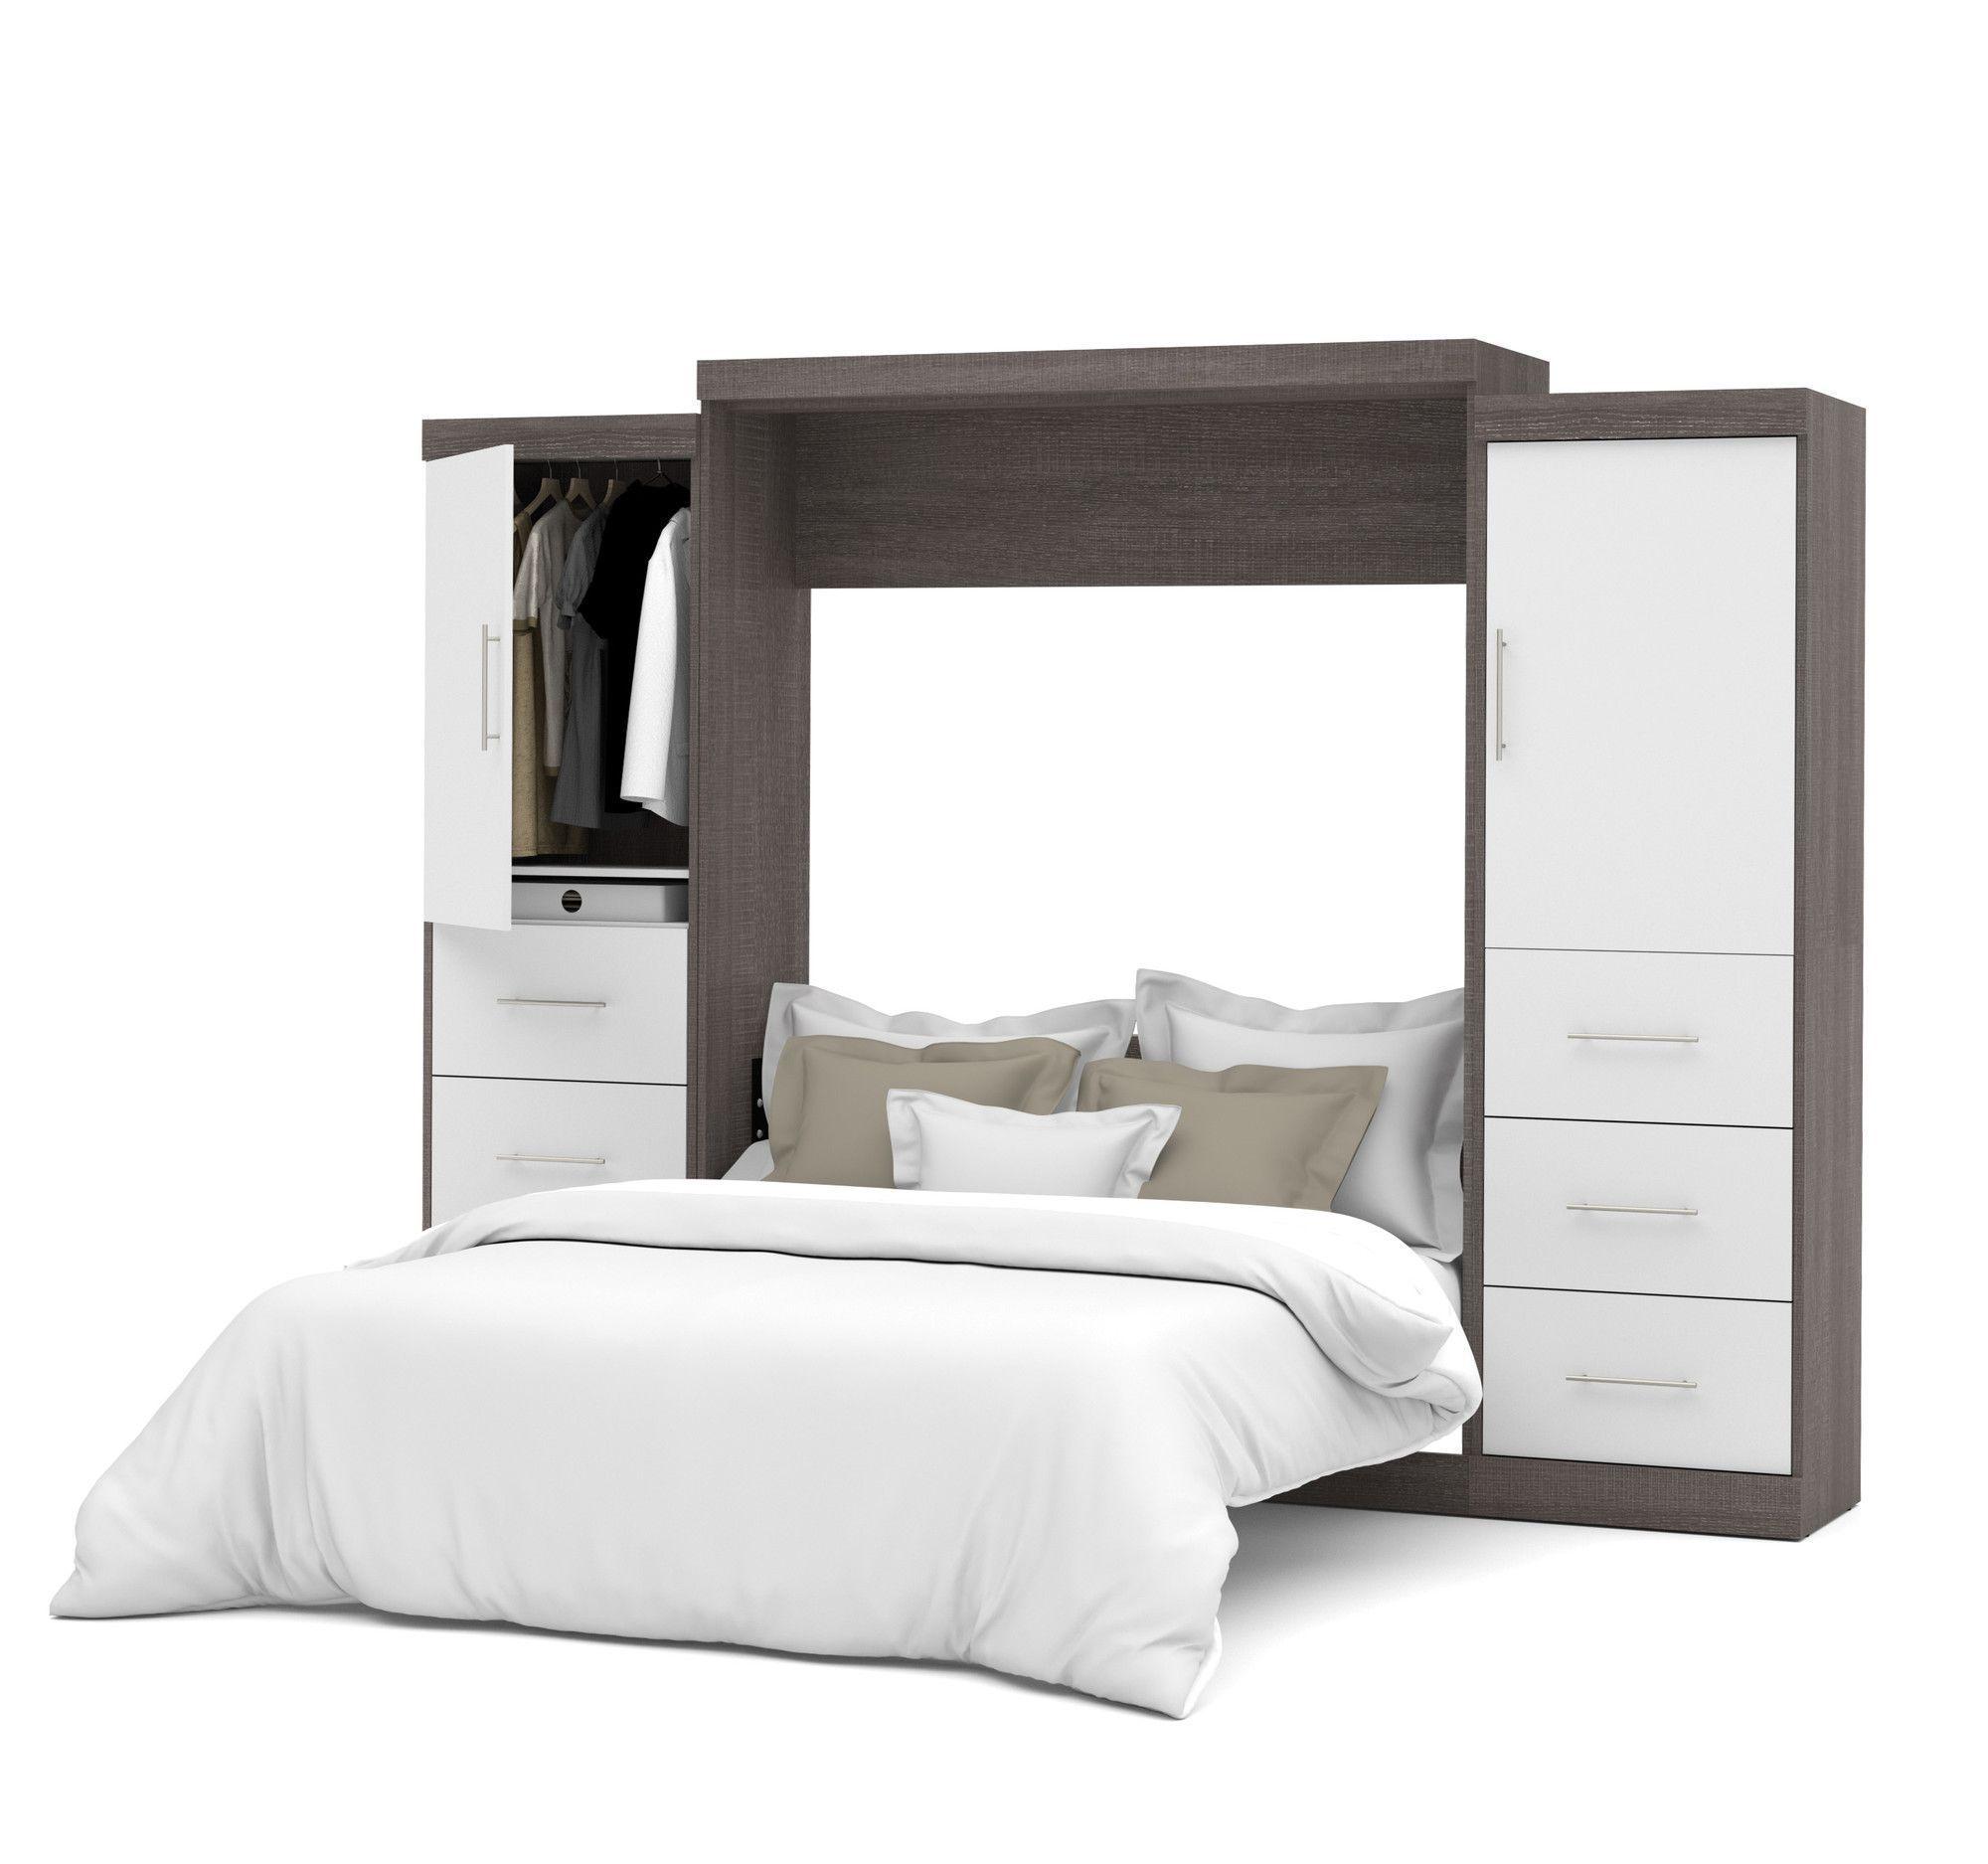 truett queen murphy bed murphy beds pinterest queen murphy bed